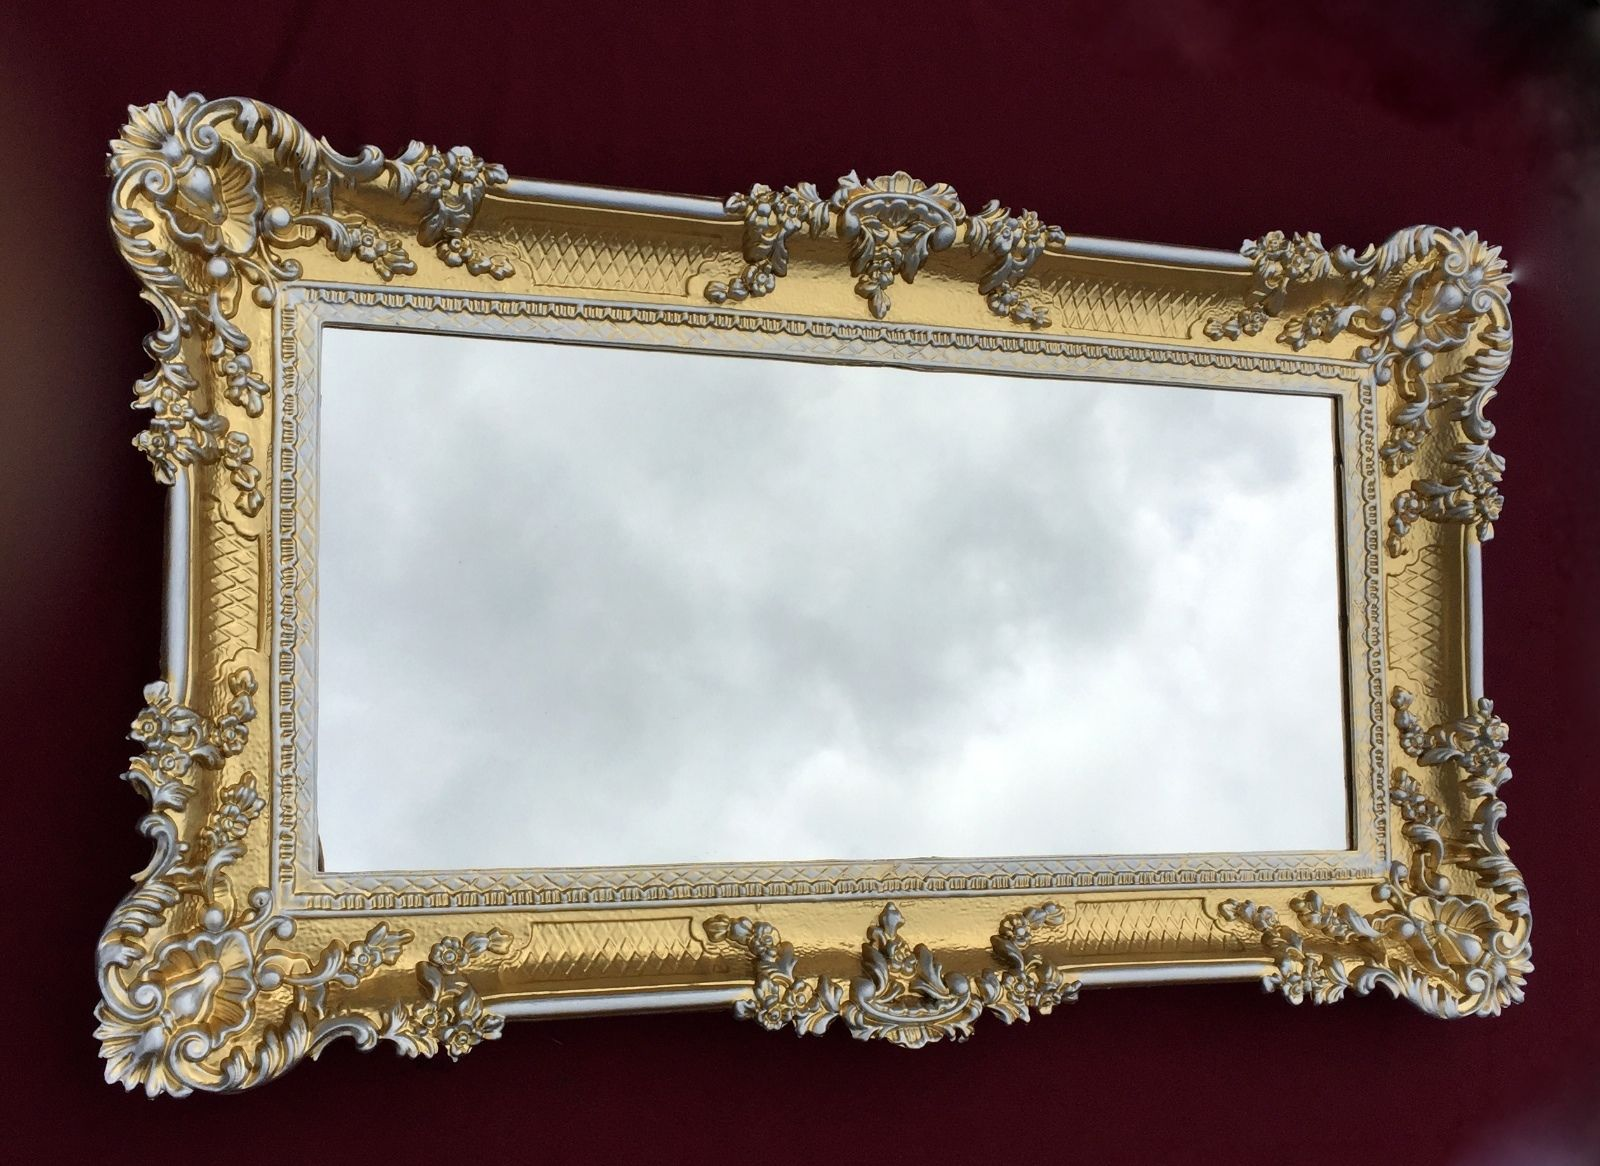 Wandspiegel Barock Gold-Silber Spiegel Antik 97x57 Badspiegel ...